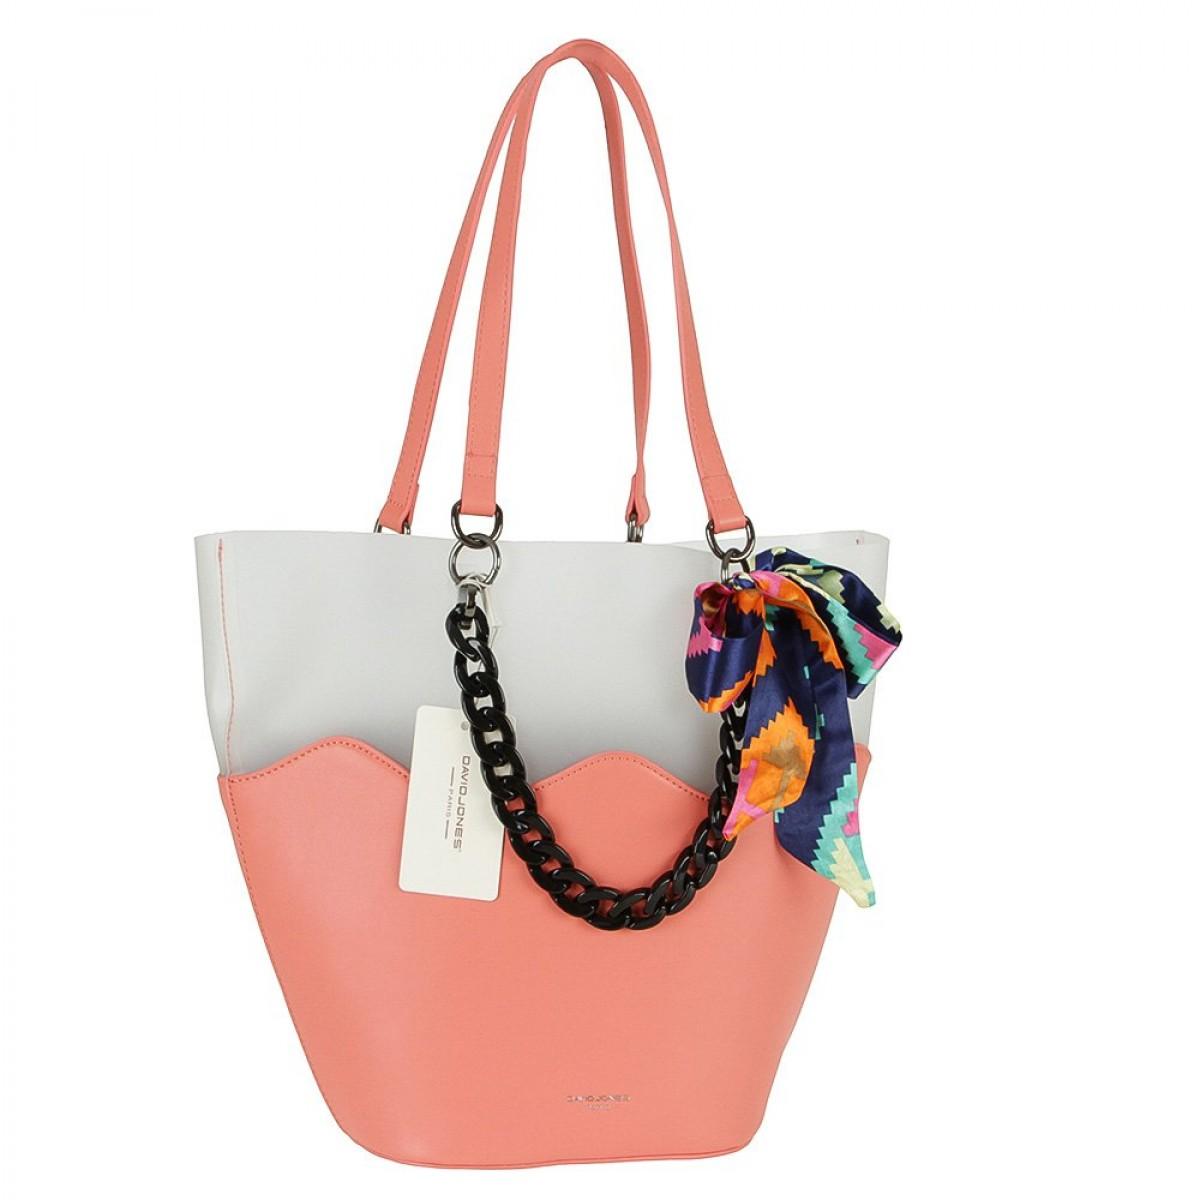 Жіноча сумка David Jones CM5645 CORAL